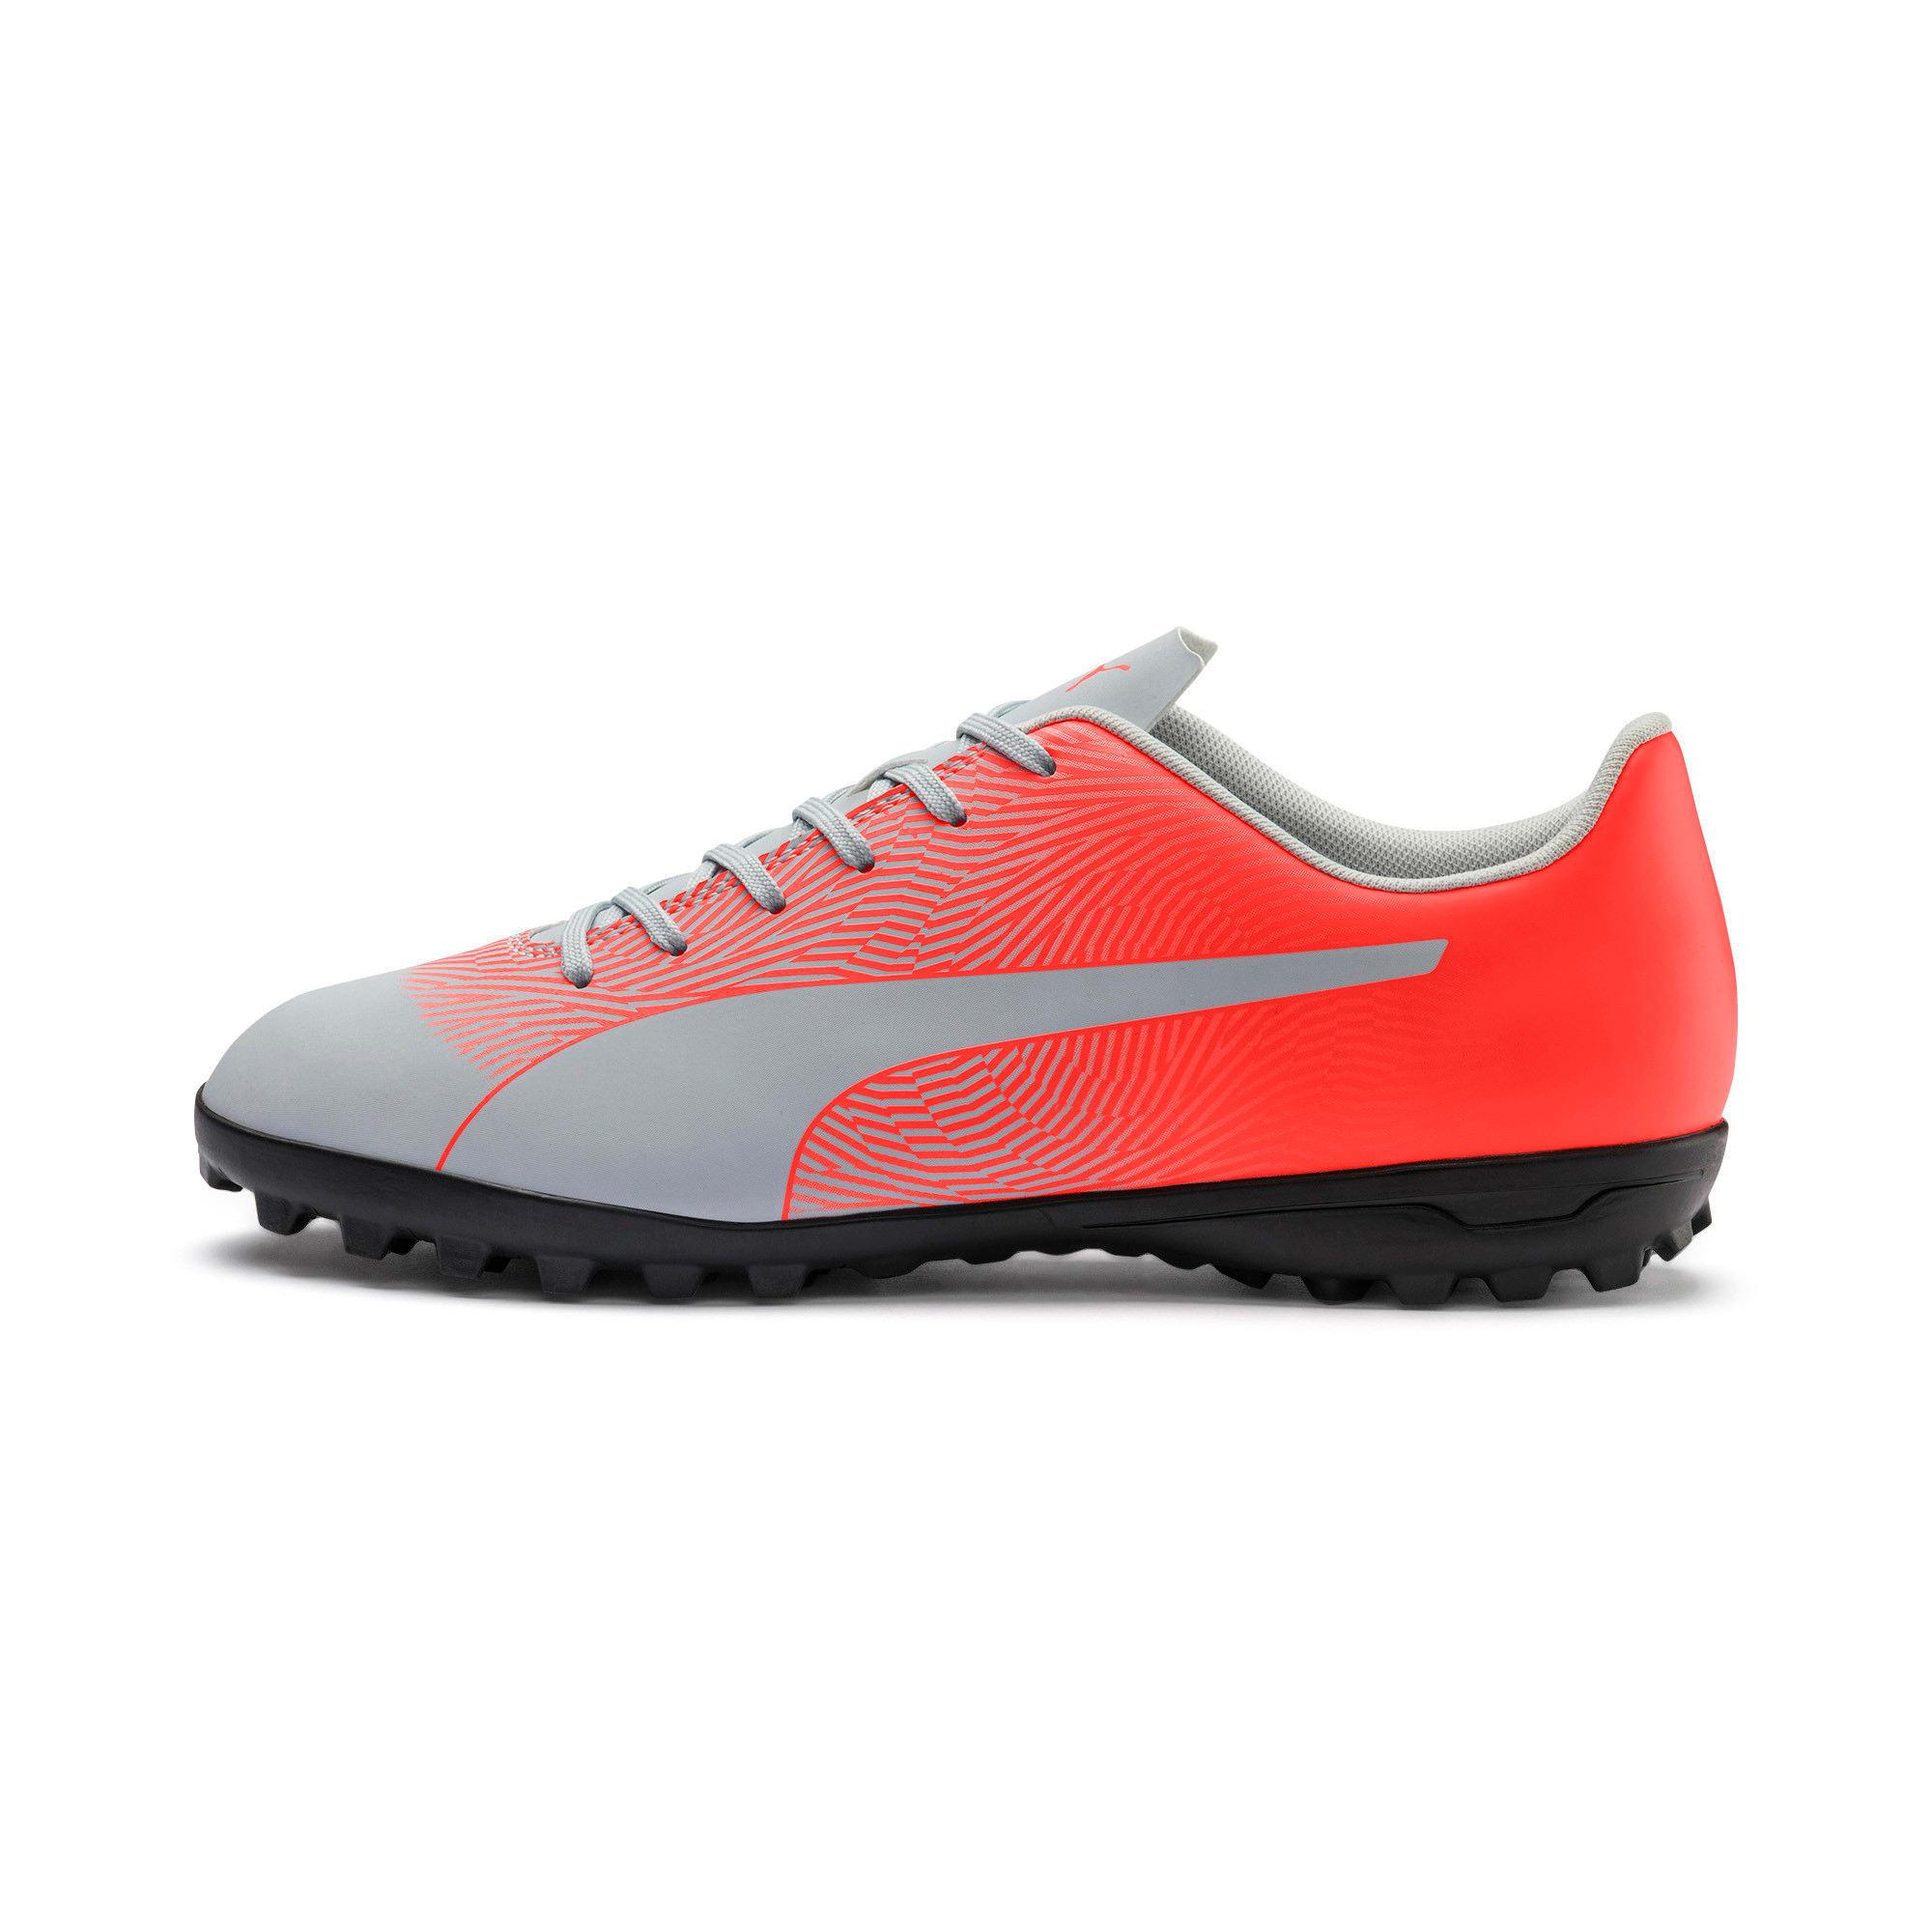 Thumbnail 1 of PUMA Spirit II TT Men's Soccer Shoes, Glacial Blue-Nrgy Red, medium